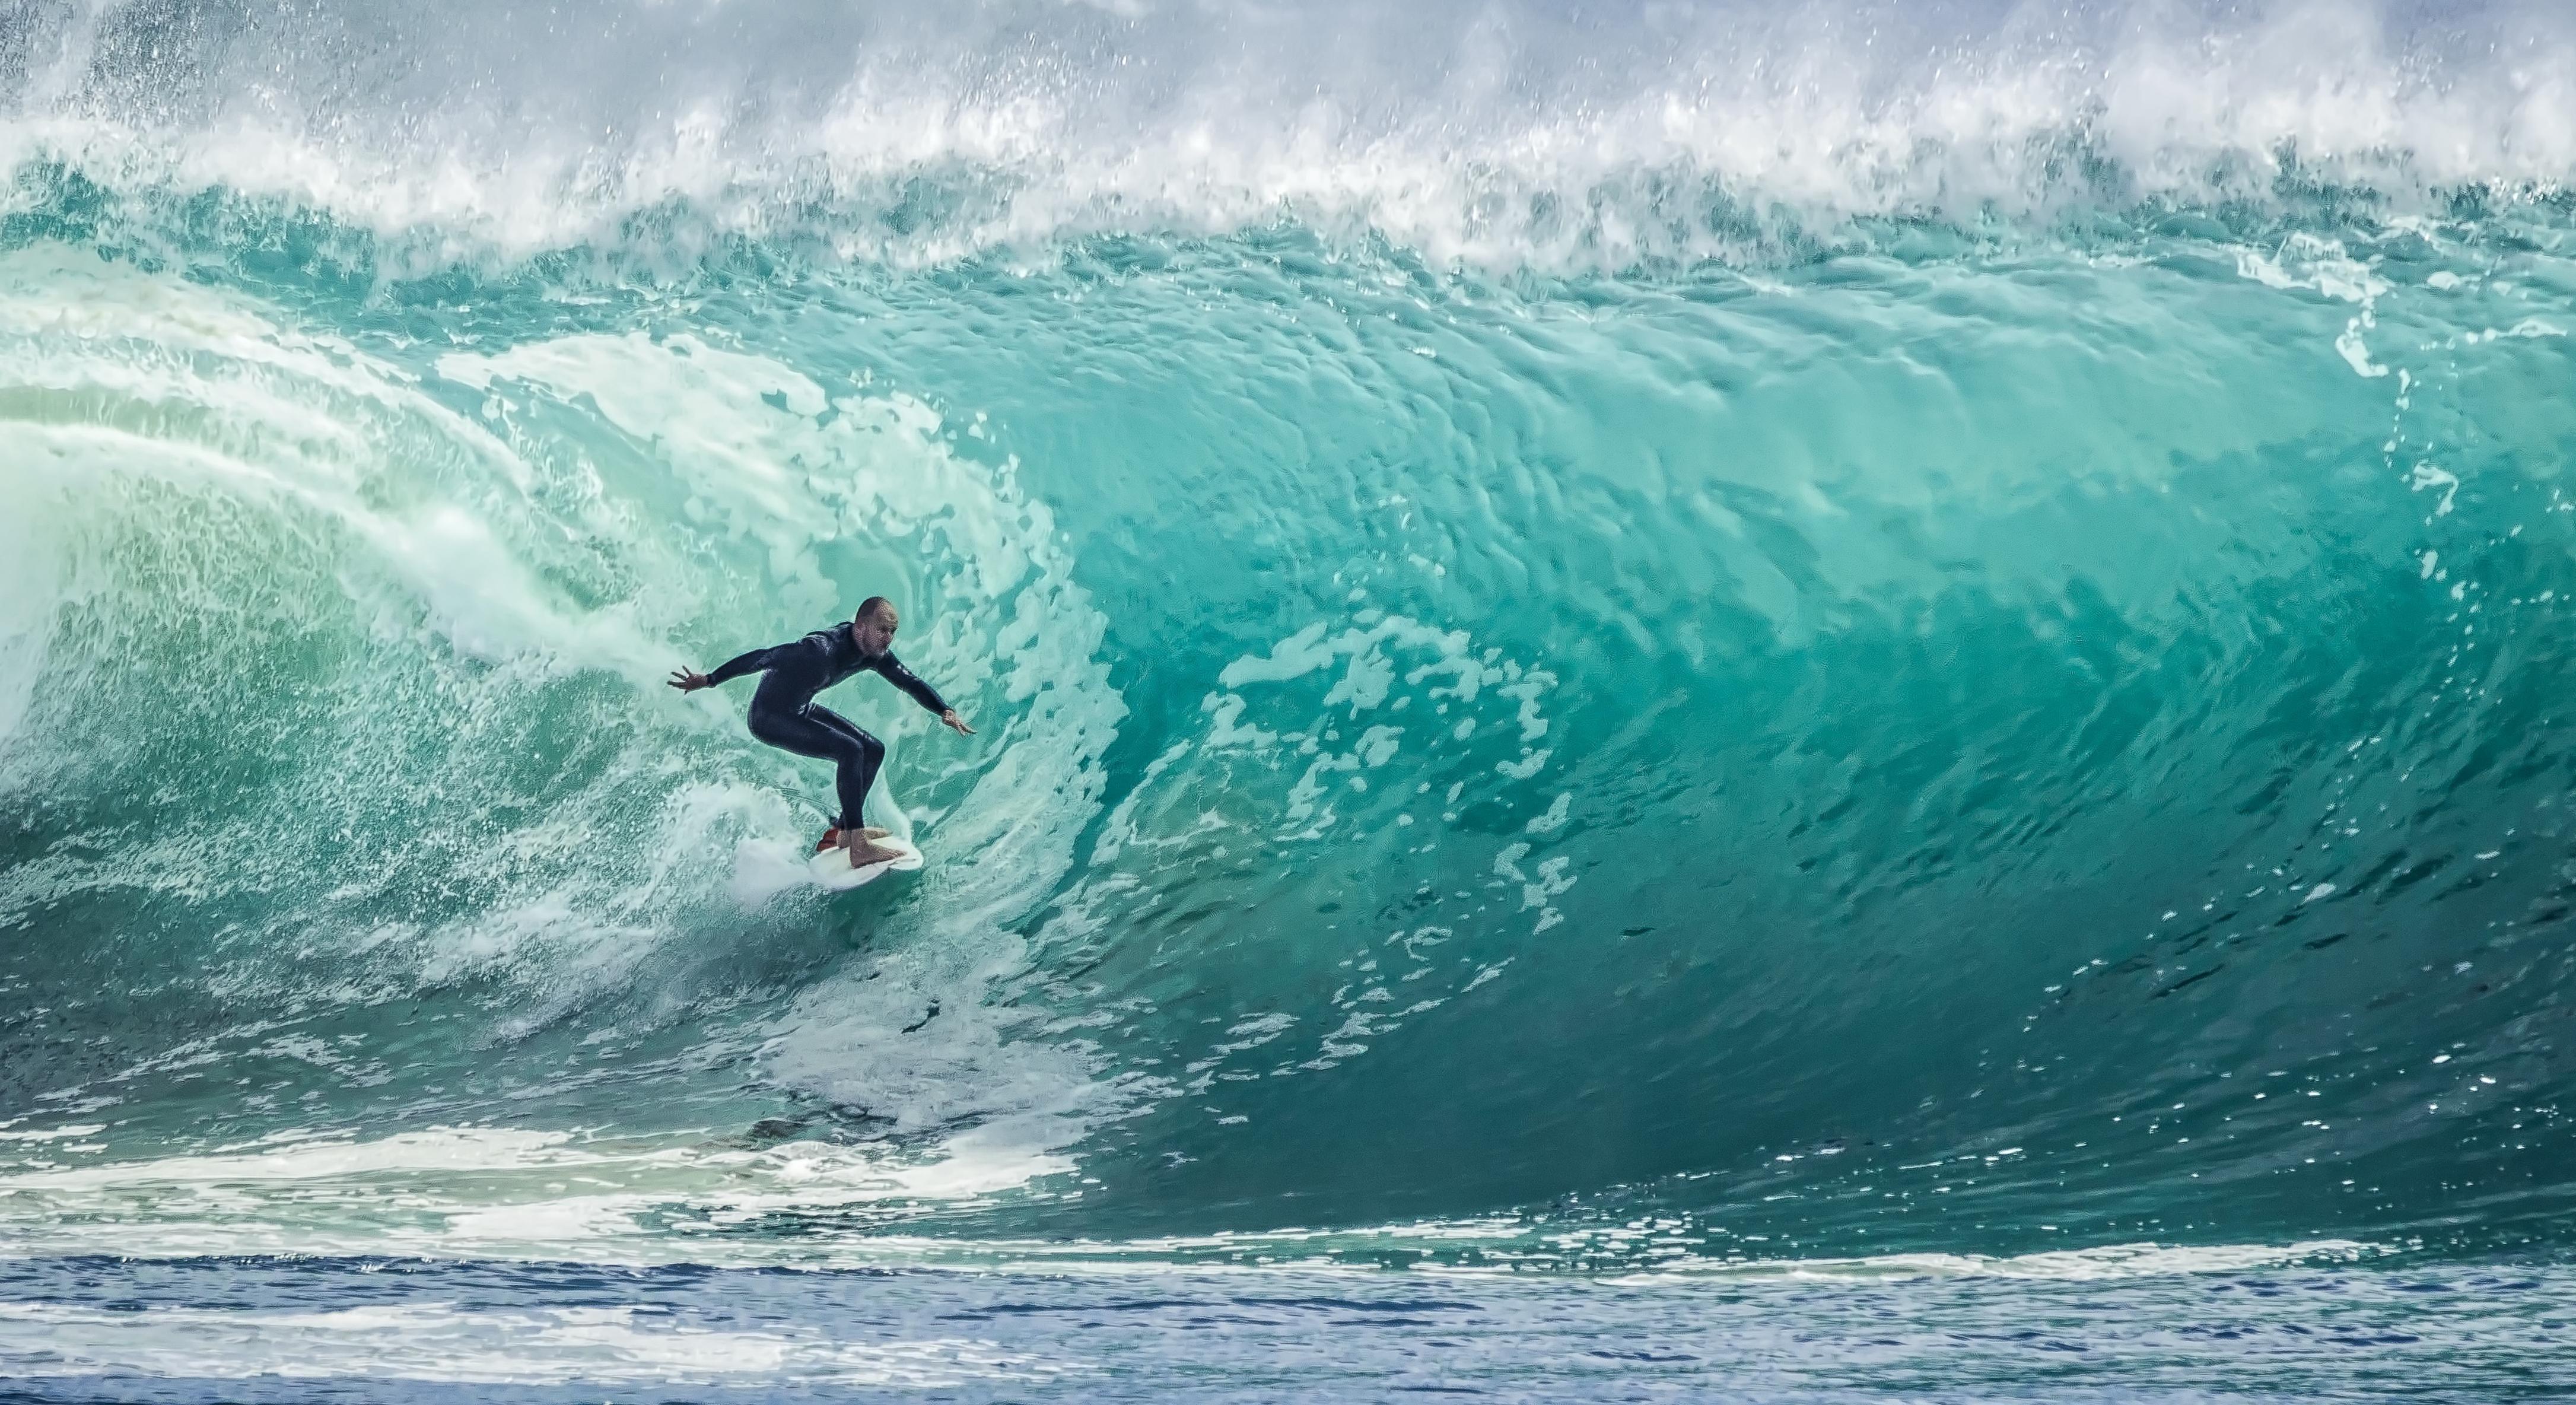 Water, Wave, Sea, Ocean, Surfer, Swimmer, Beach, Summer